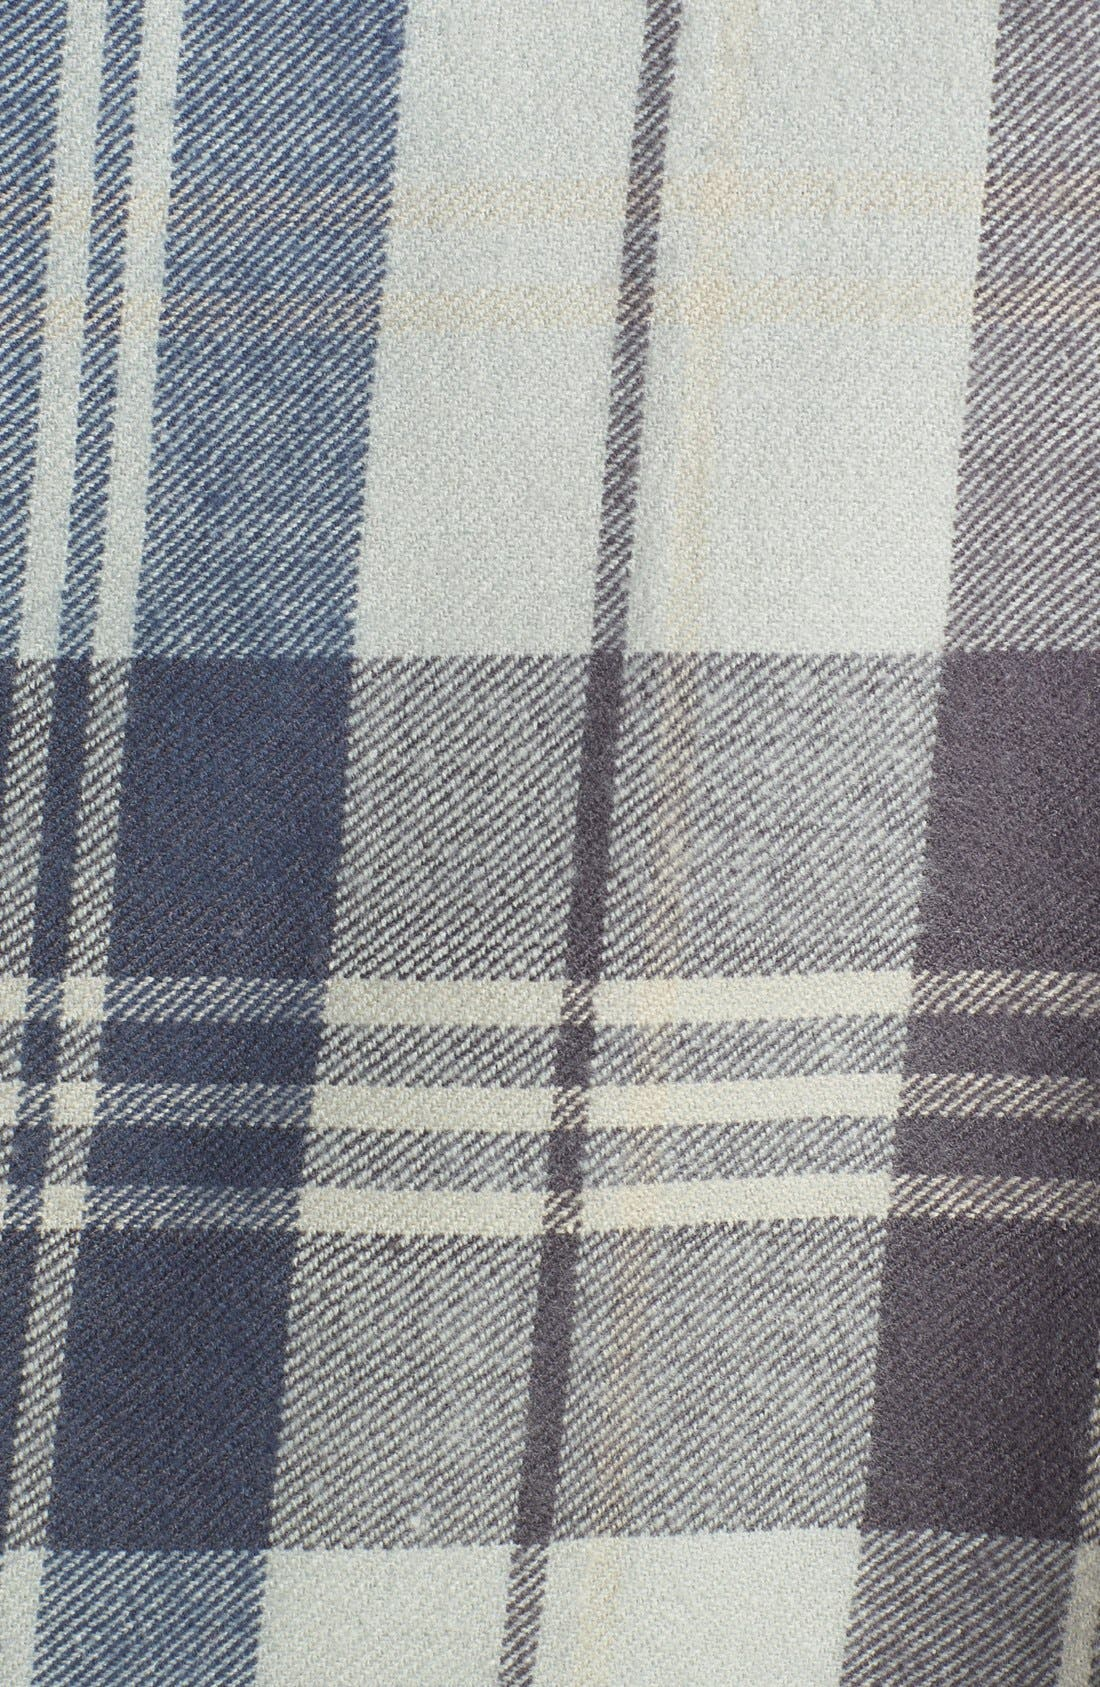 Alternate Image 2  - Tildon Knit Poncho